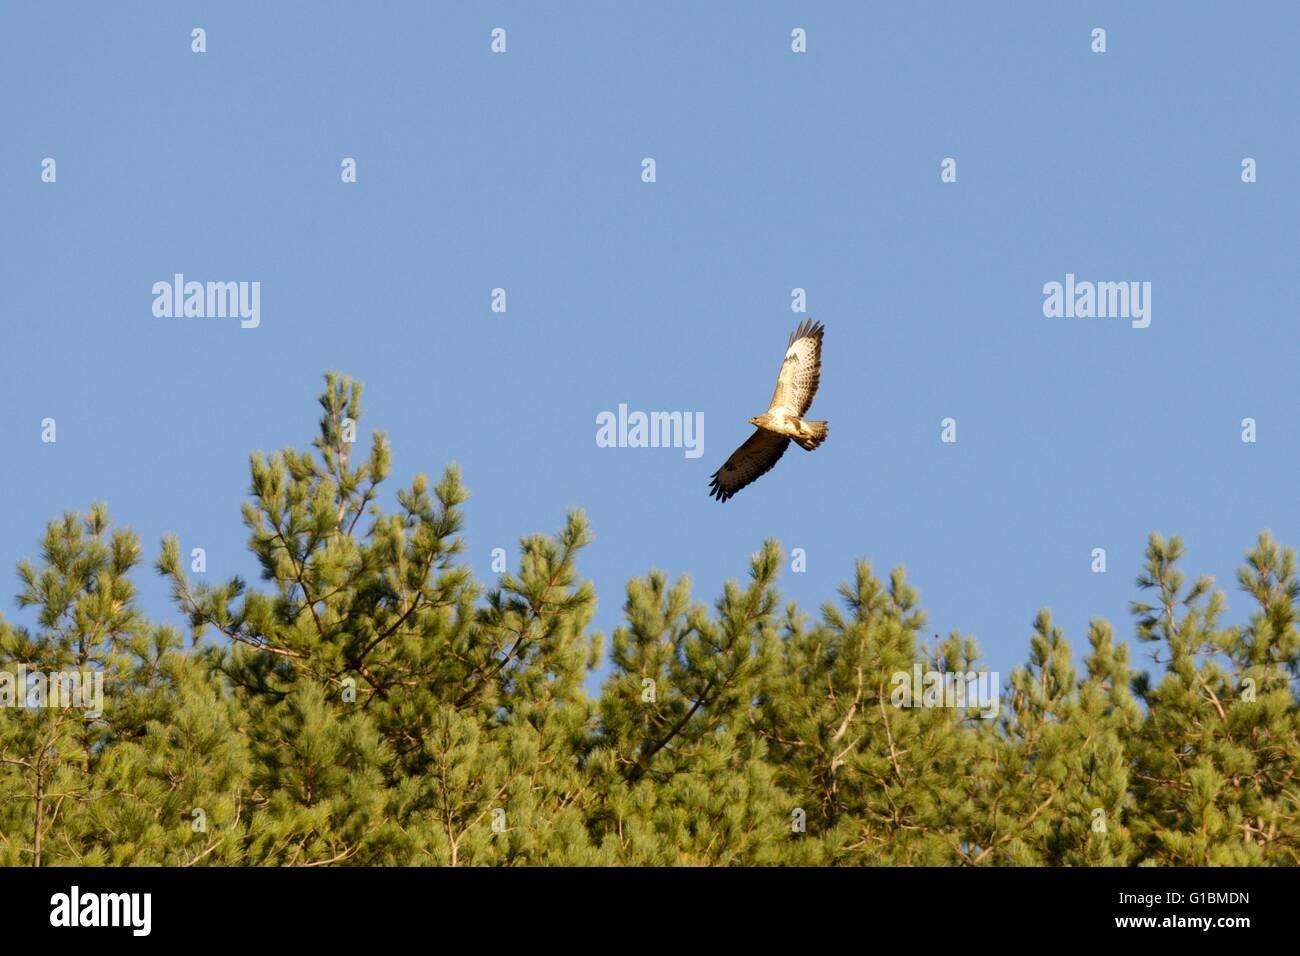 Common Buzzard, Buteo buteo, soaring over woodland, Wales, UK. - Stock Image